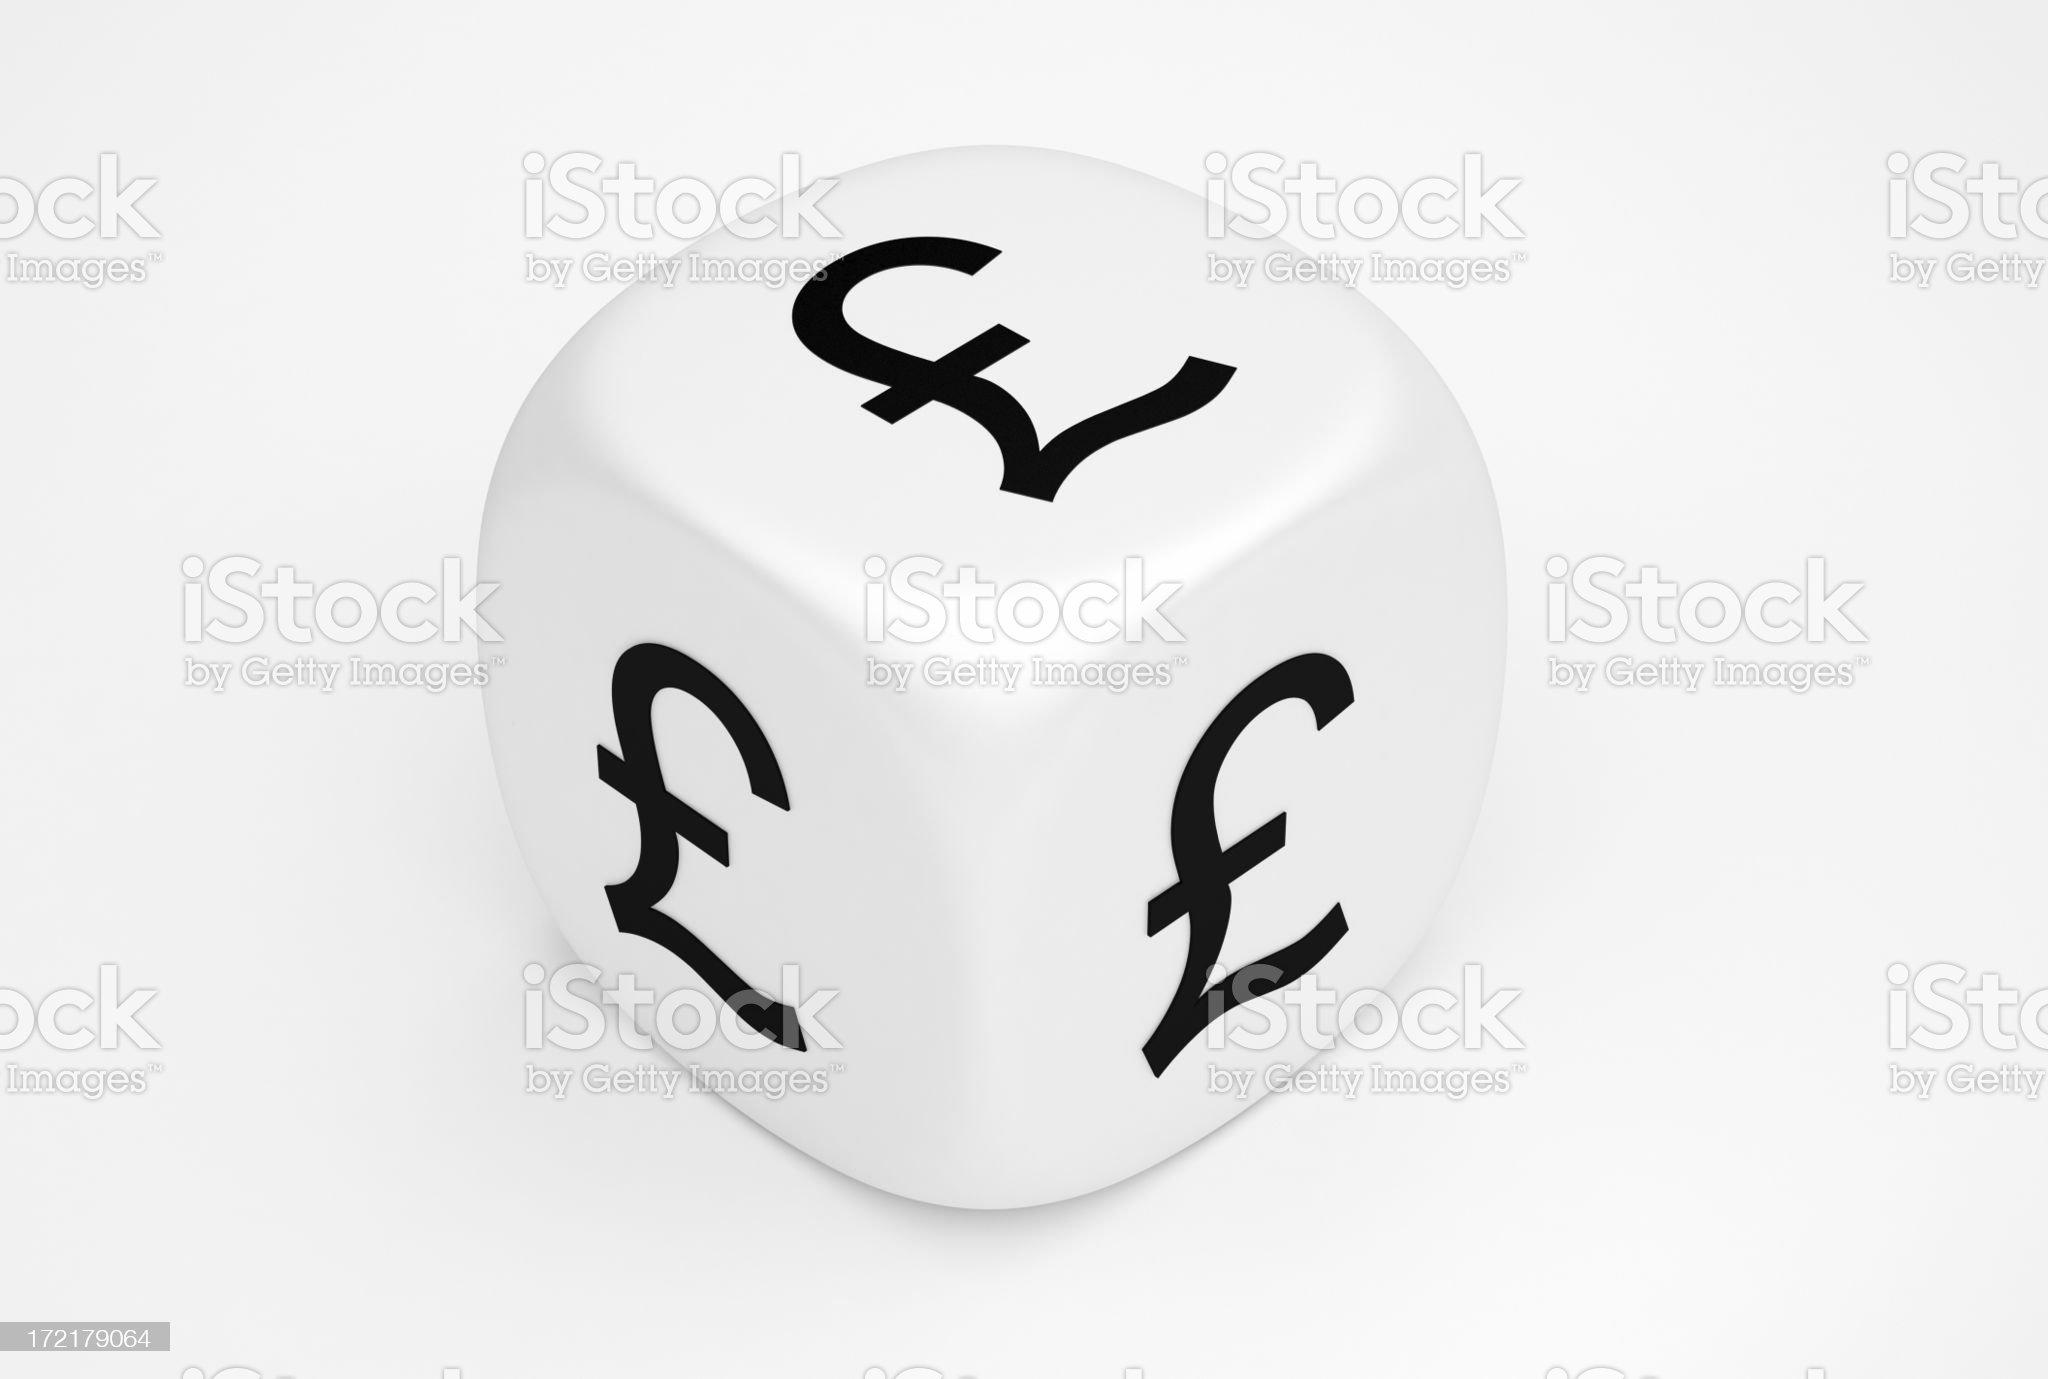 Pound Concepts royalty-free stock photo